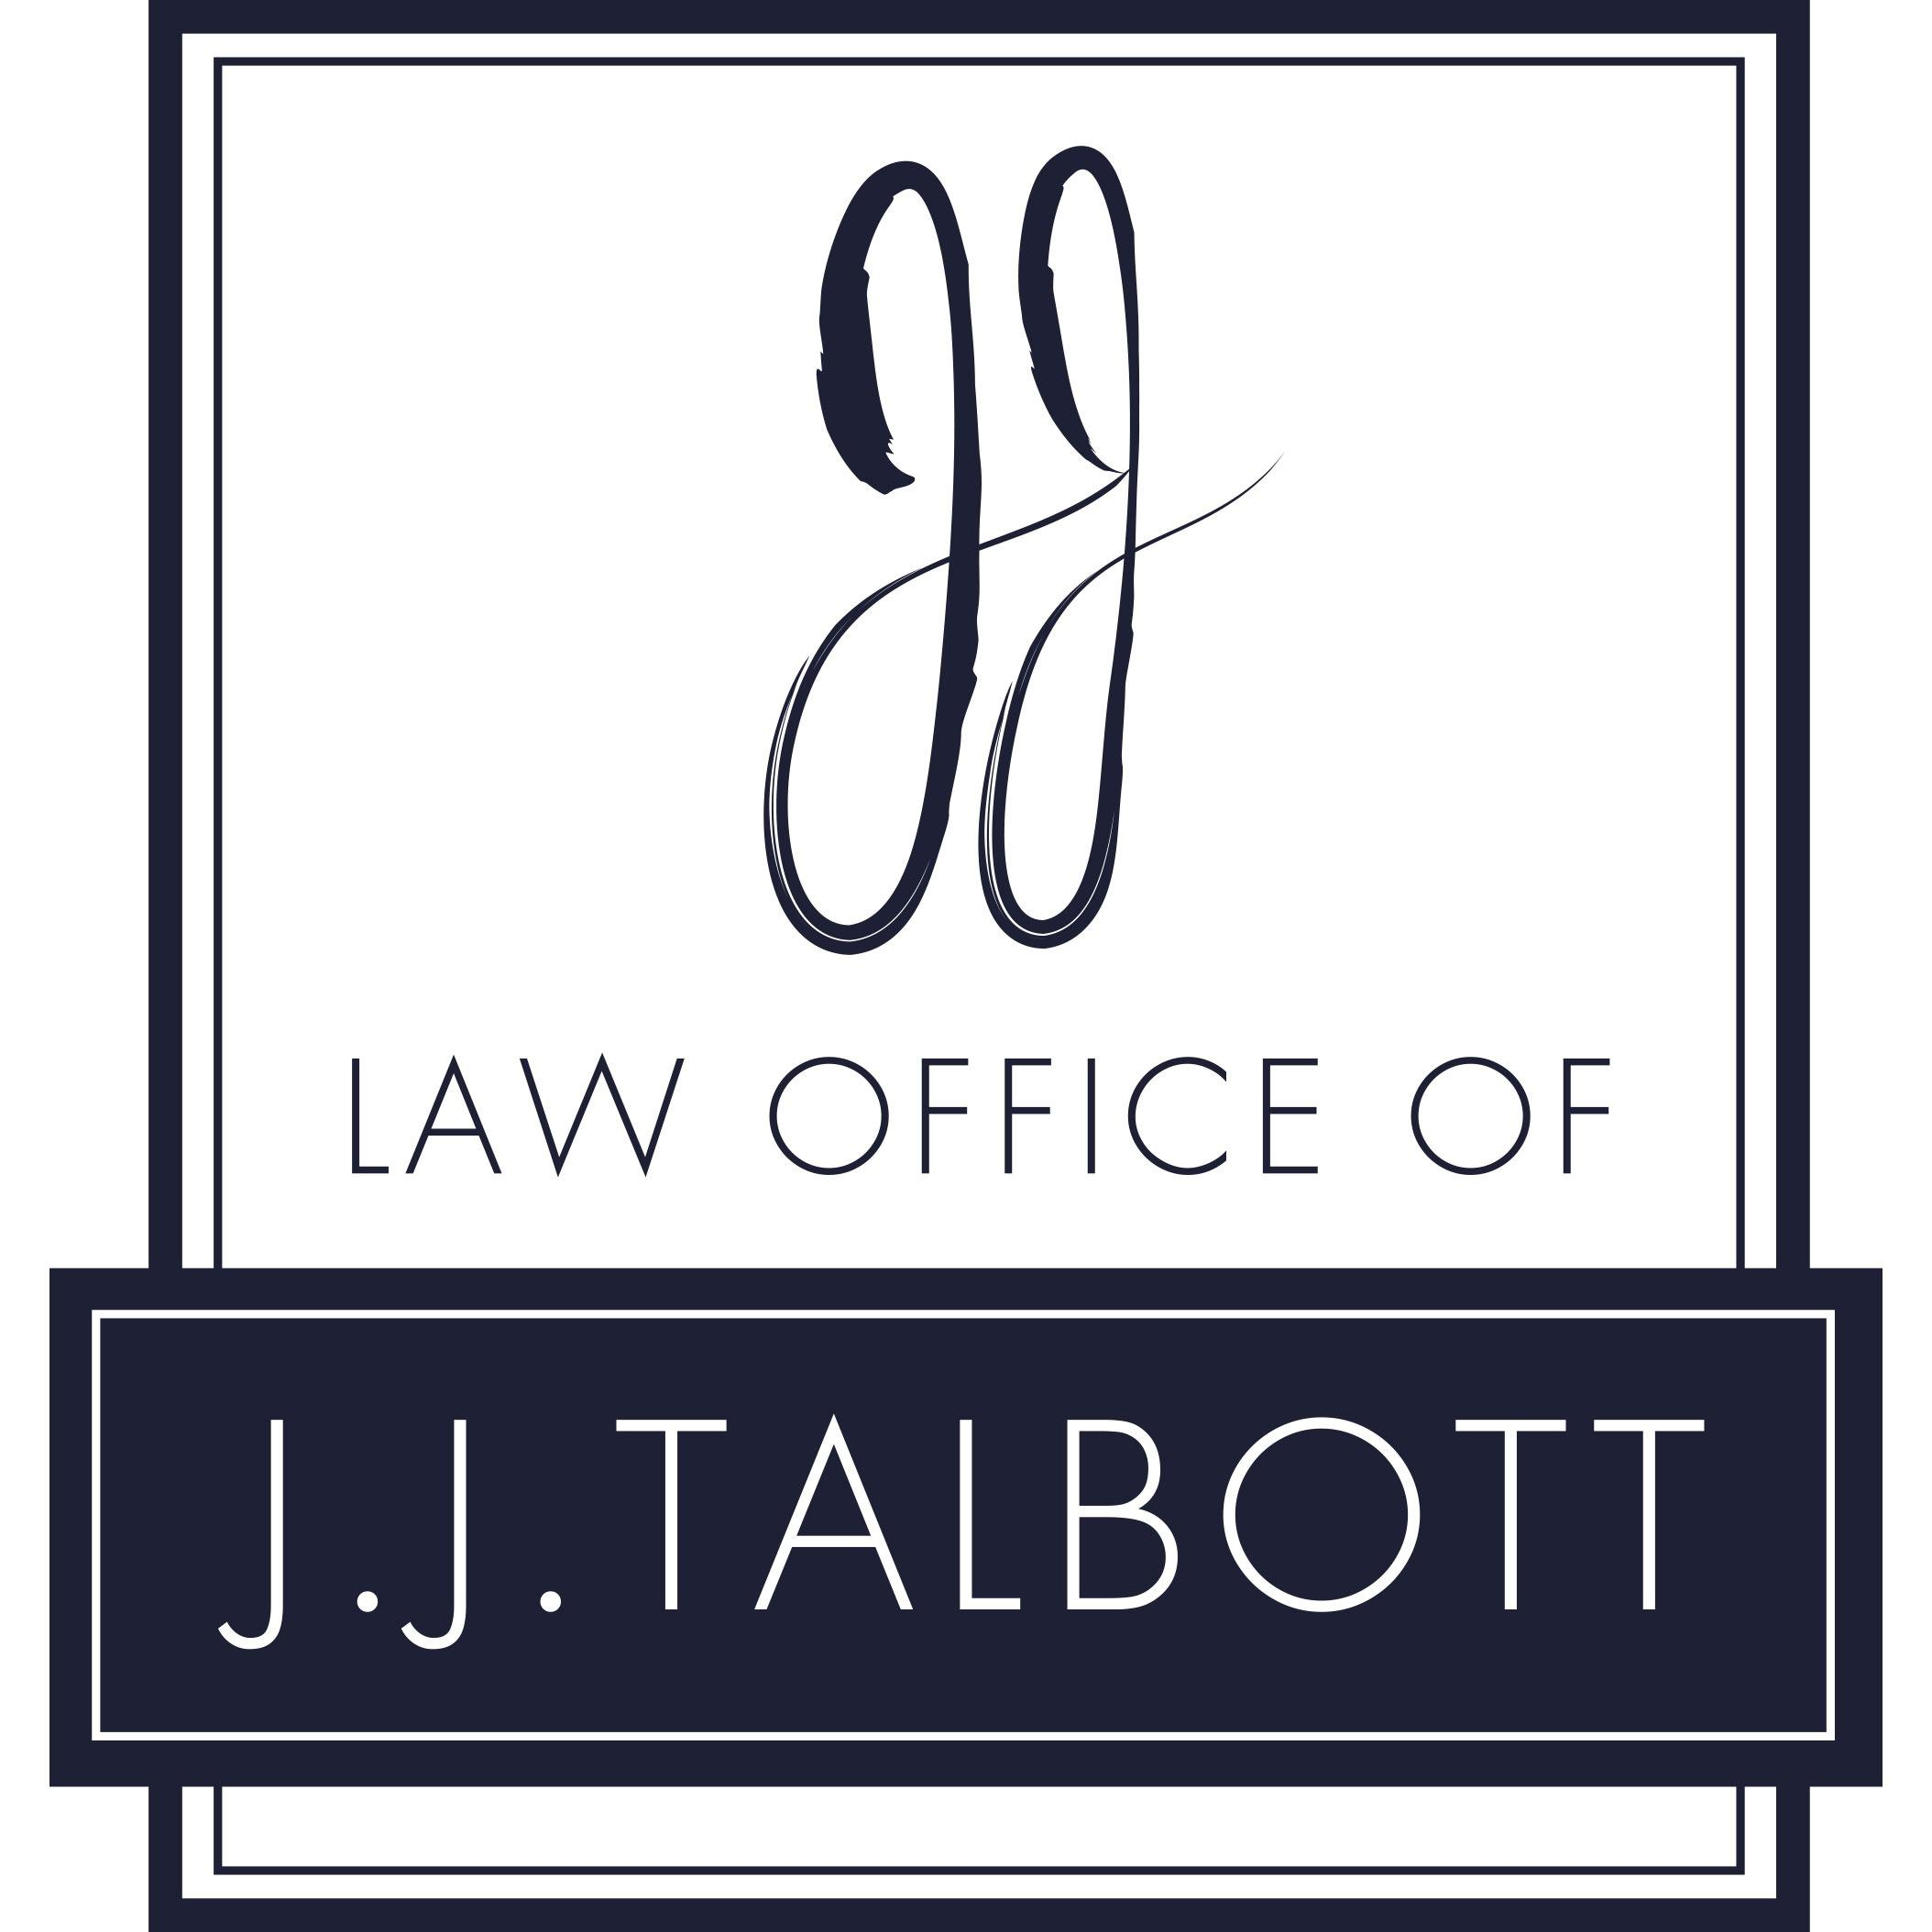 Law Office of J.J. Talbott